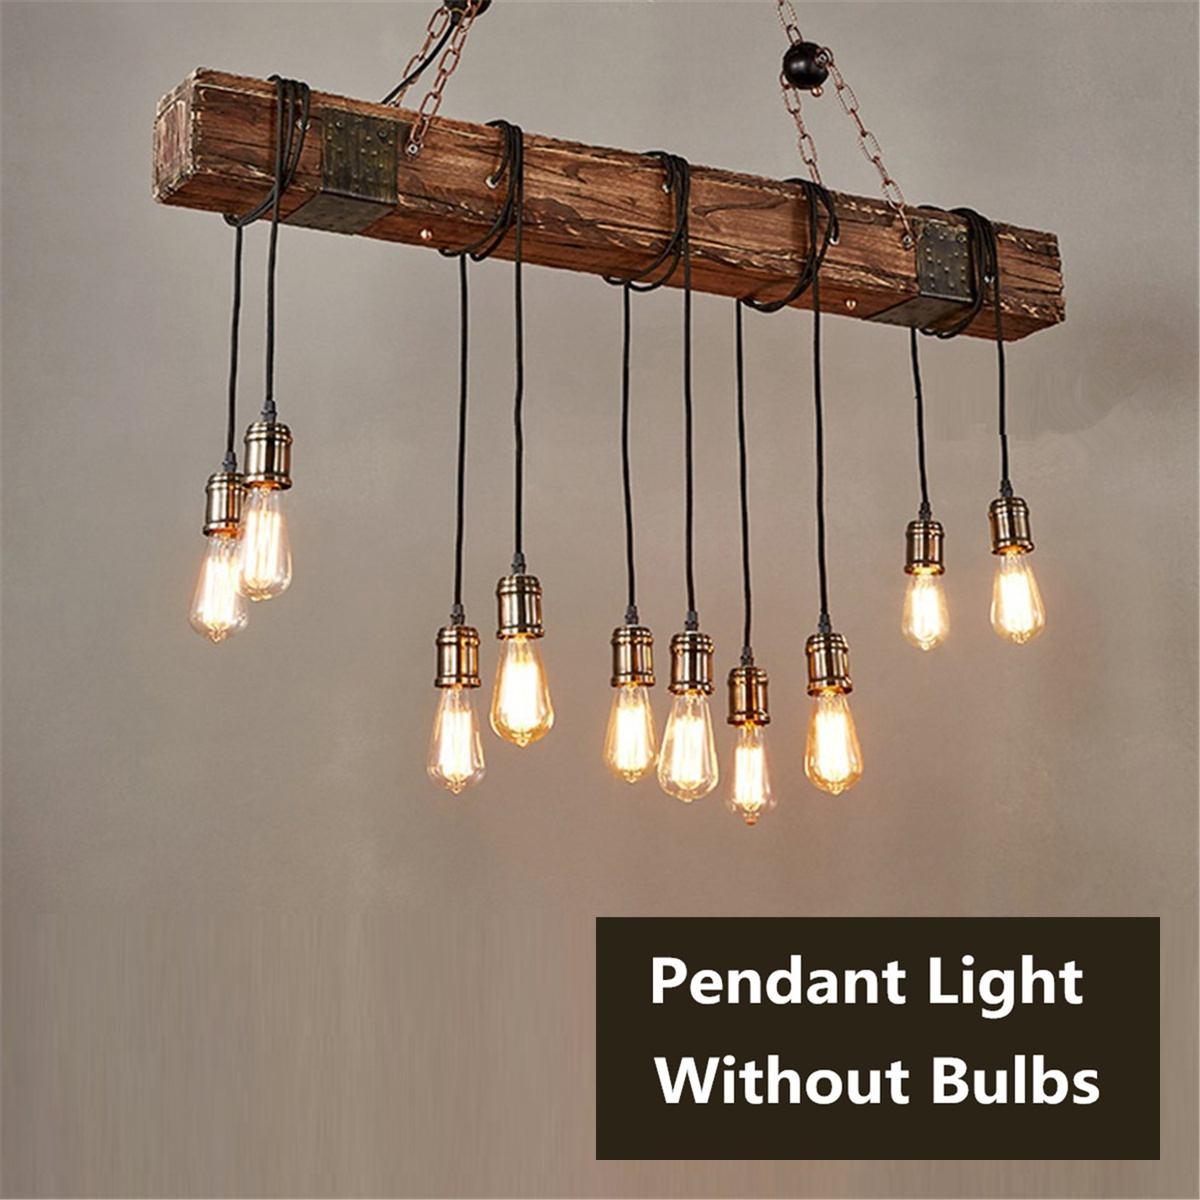 E26 110V Vintage Wood Industrial Pendant Light Hanging Lamp Rustic Light Fixture Restaurant Bar Home Decoration Loft Lighting